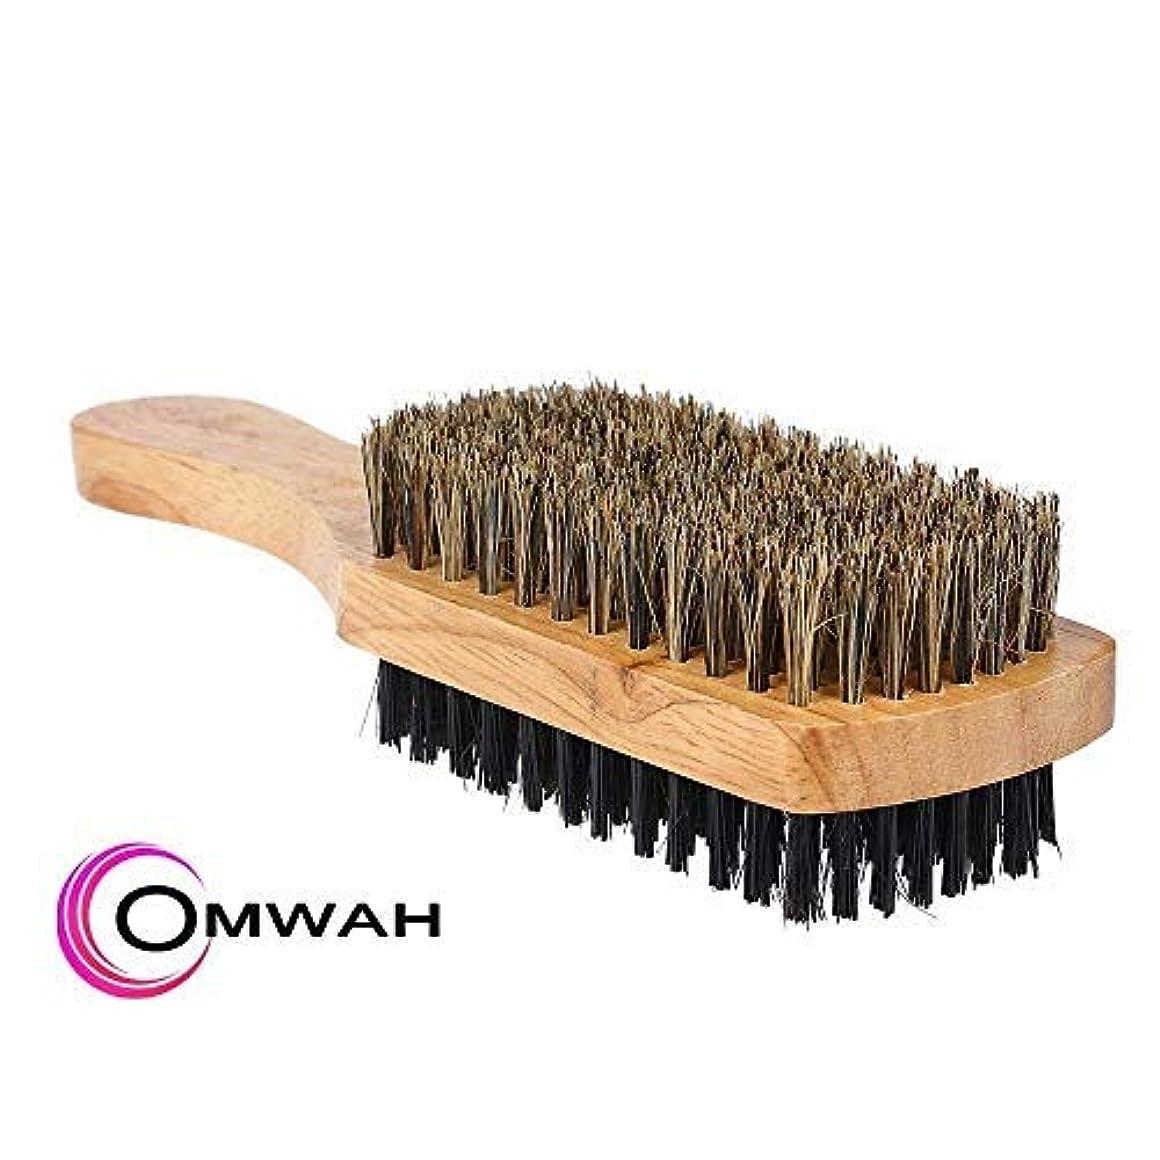 Omwah Double Sided 2 Sided Facial Hairbrush Styling Beard Brush Mens Boar Bristle [並行輸入品]